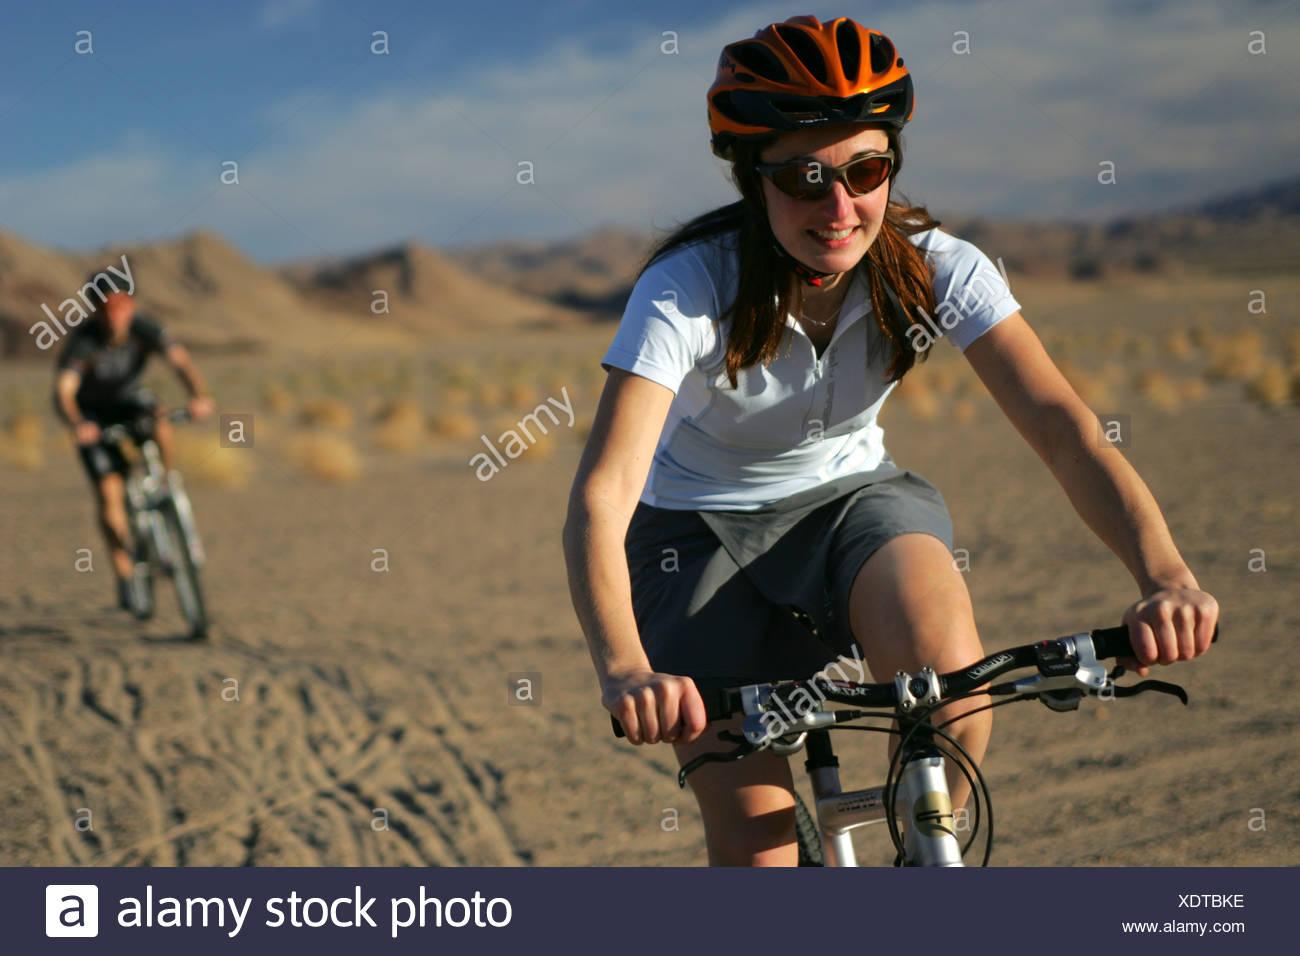 Two mountain bikers near Dumont Desert, California. - Stock Image